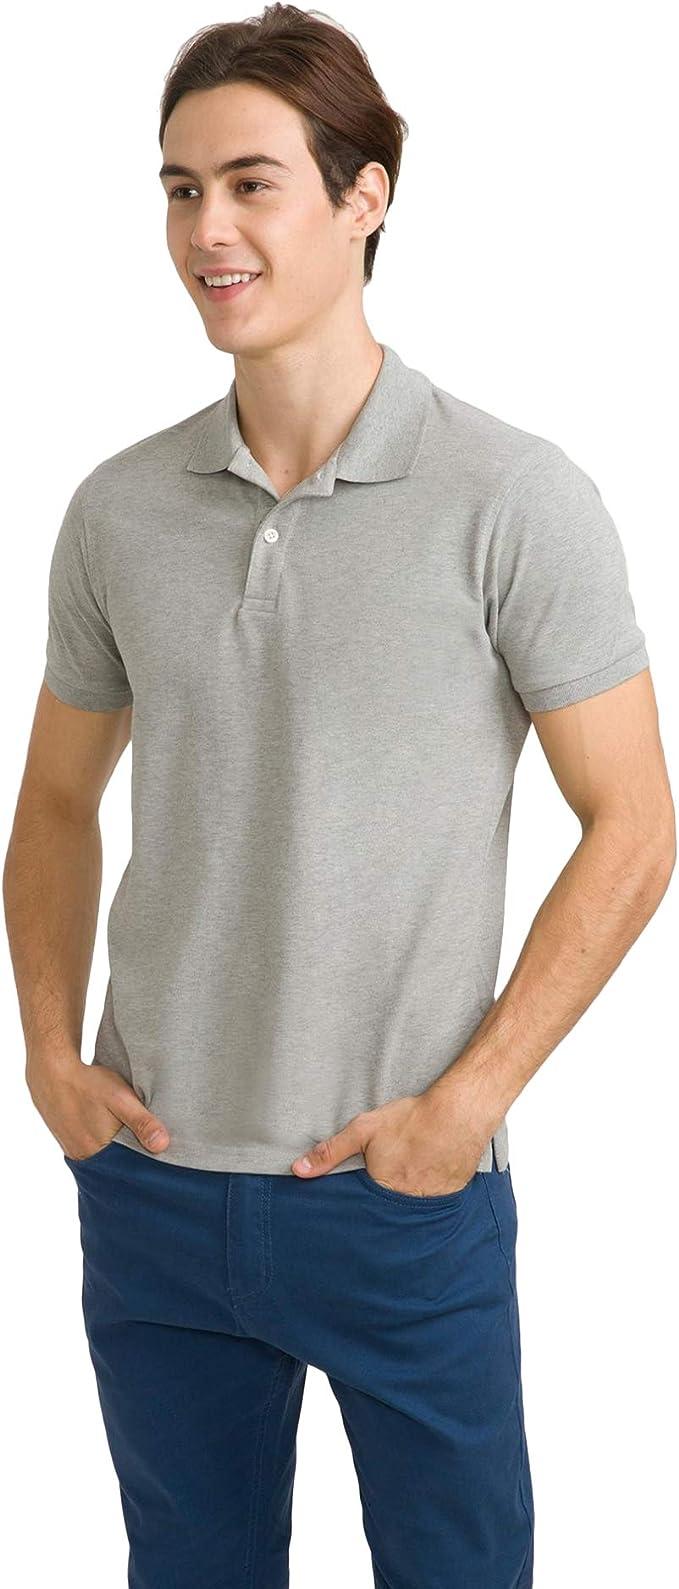 bossini Metropolitan Men Solid Ztay Dry Short Sleeve Polo Shirt Grey M,US Size 38